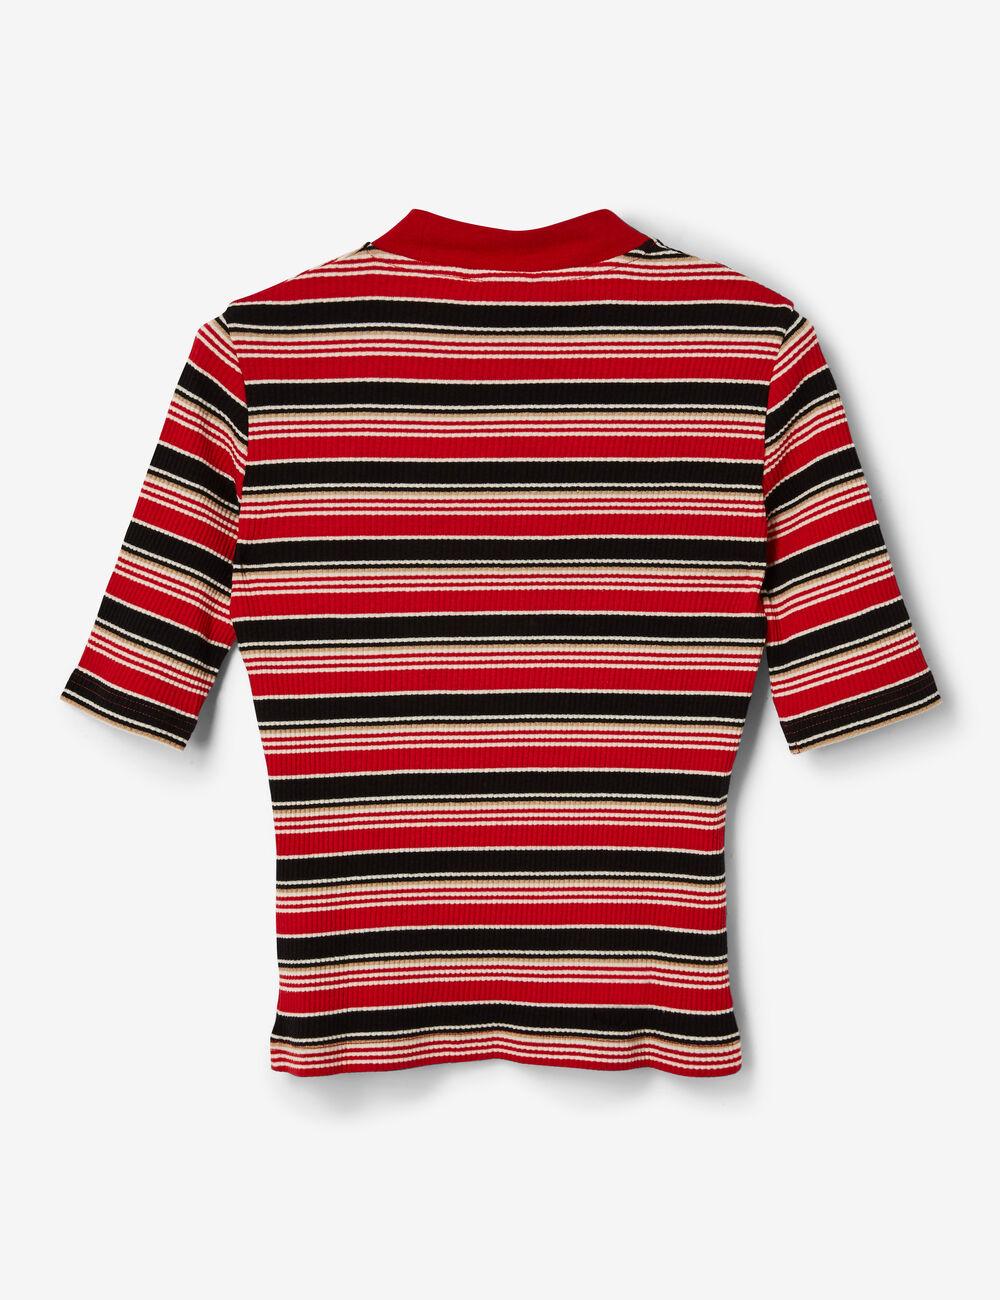 tee shirt c tel ray rouge noir blanc et beige femme. Black Bedroom Furniture Sets. Home Design Ideas